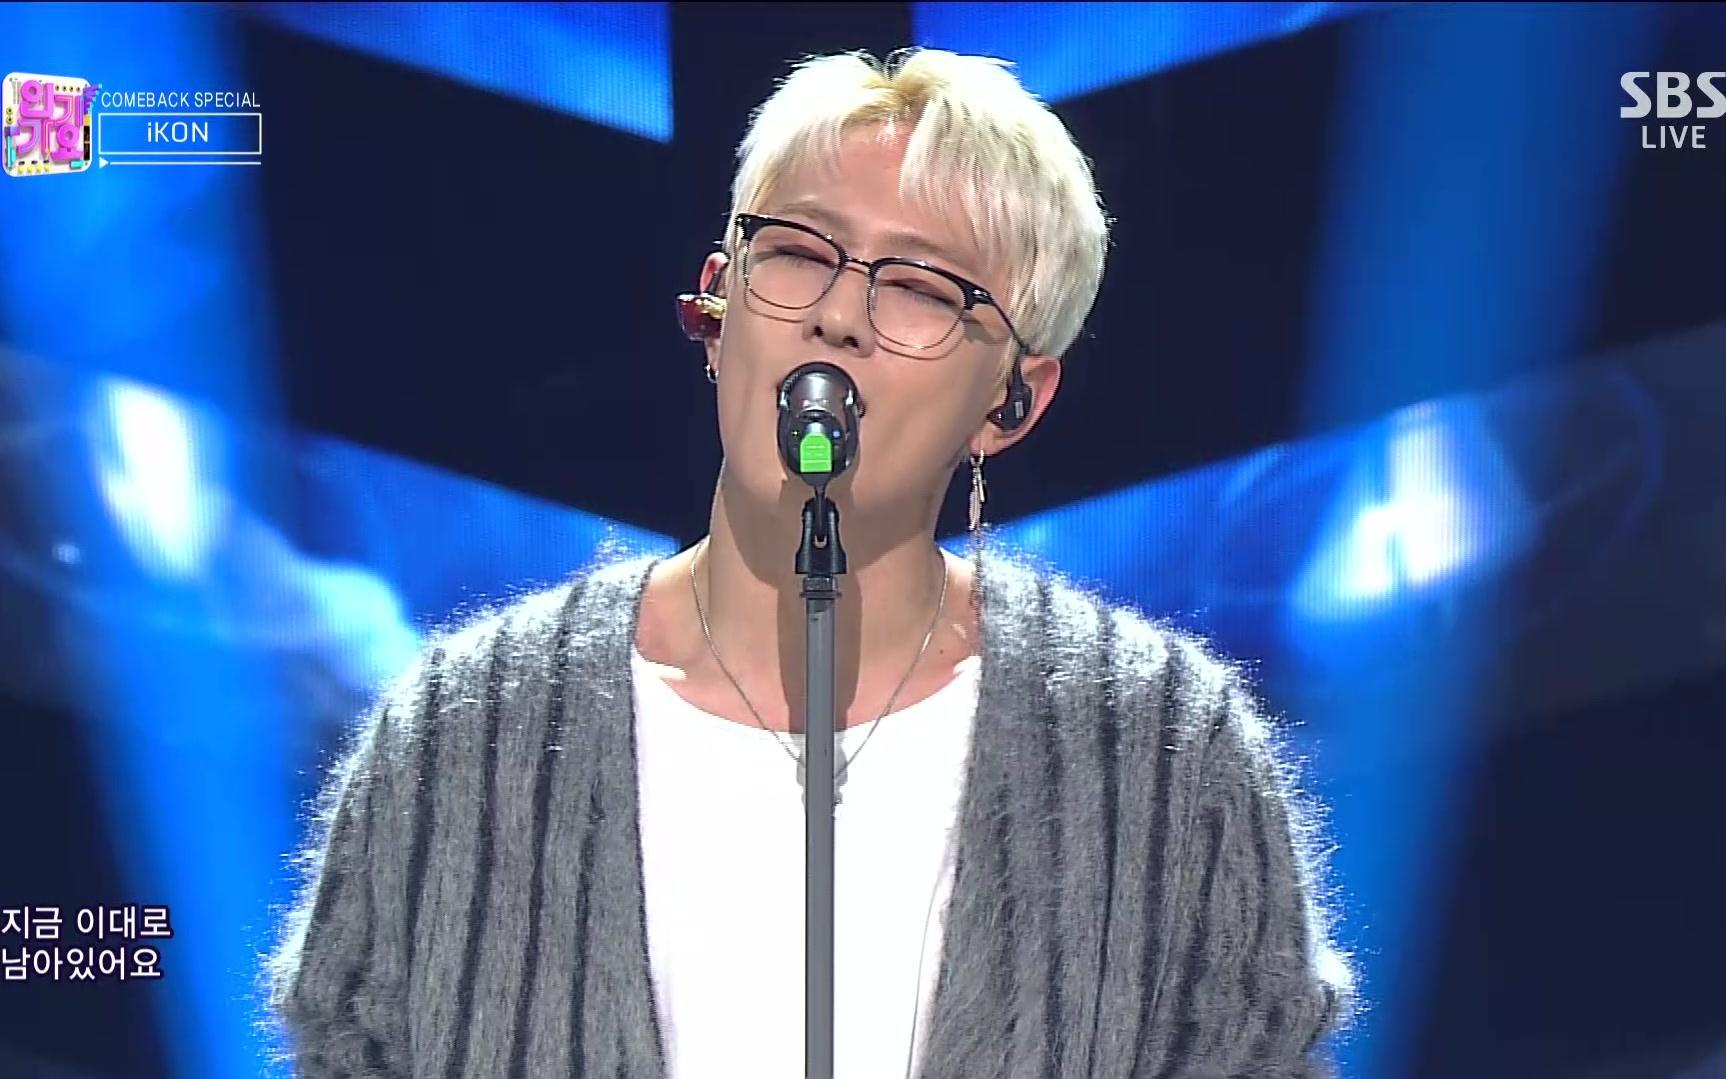 iKON - ADORE YOU 181007 SBS Popular Song_哔哩哔哩 (゜-゜)つロ 干杯~-bilibili